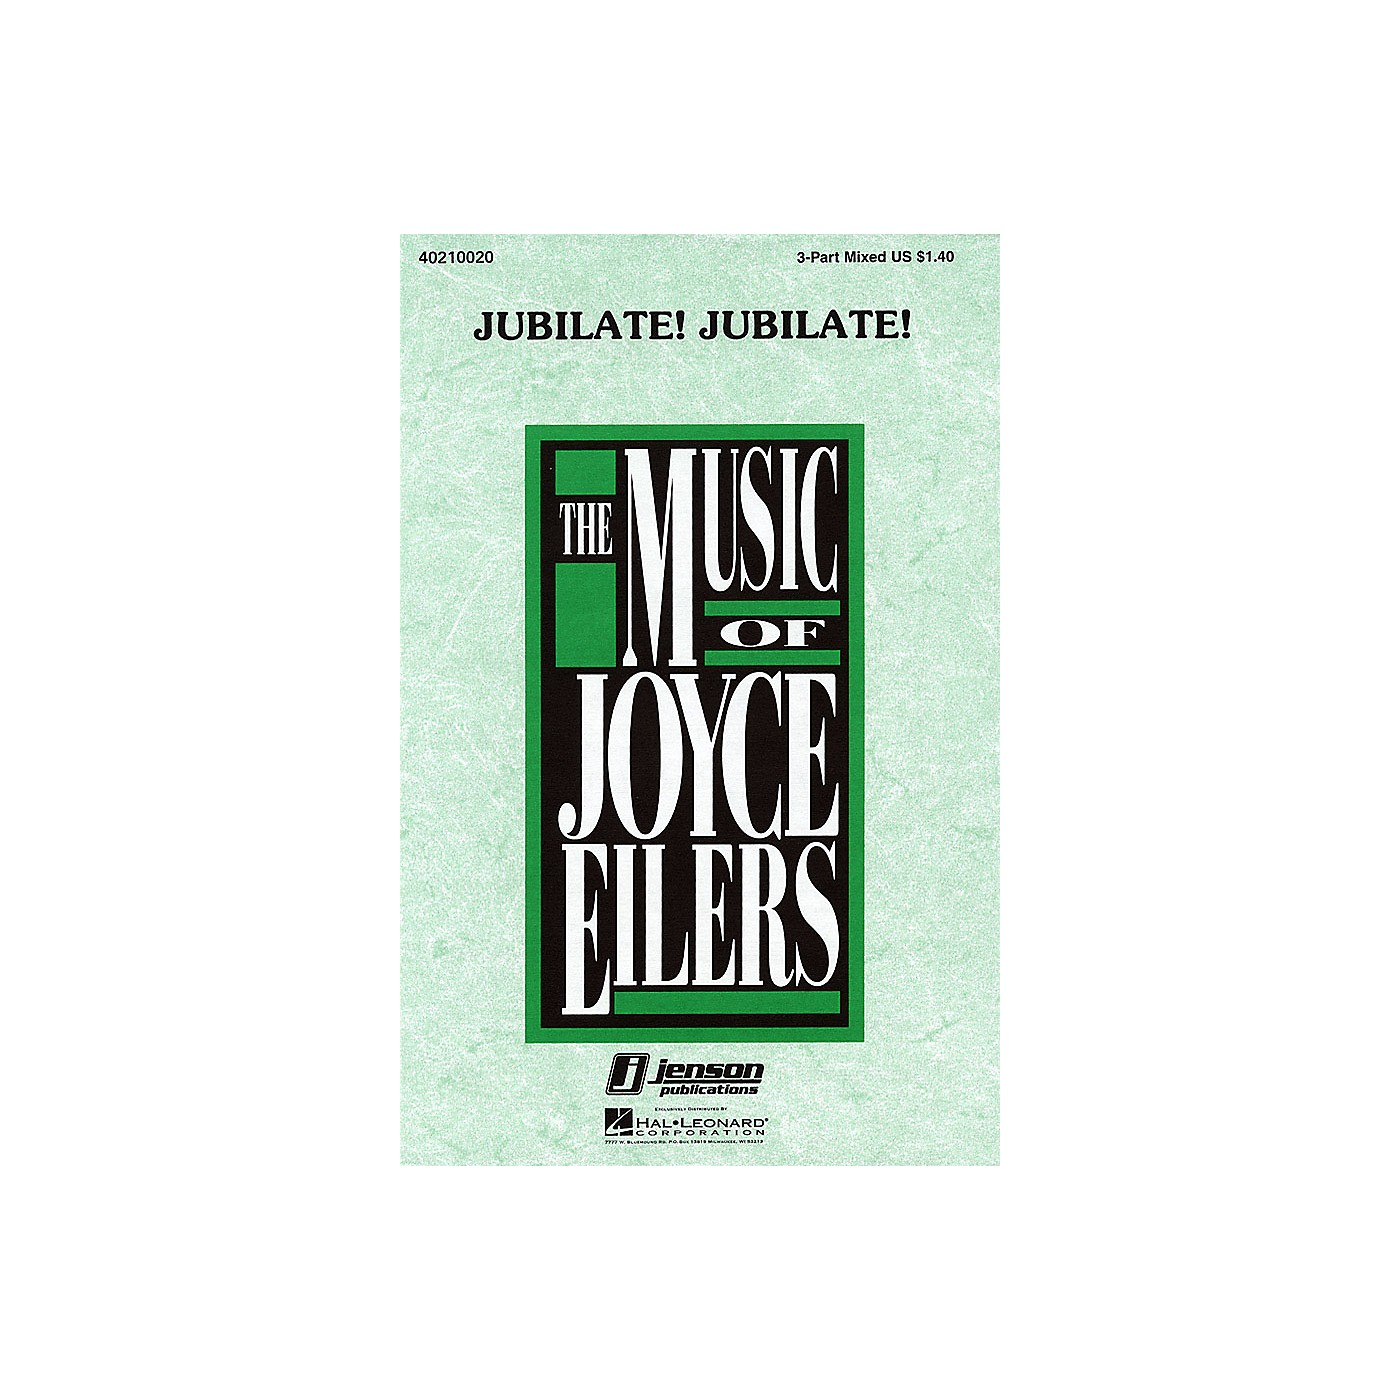 Hal Leonard Jubilate! Jubilate! 3-Part Mixed a cappella arranged by Joyce Eilers thumbnail